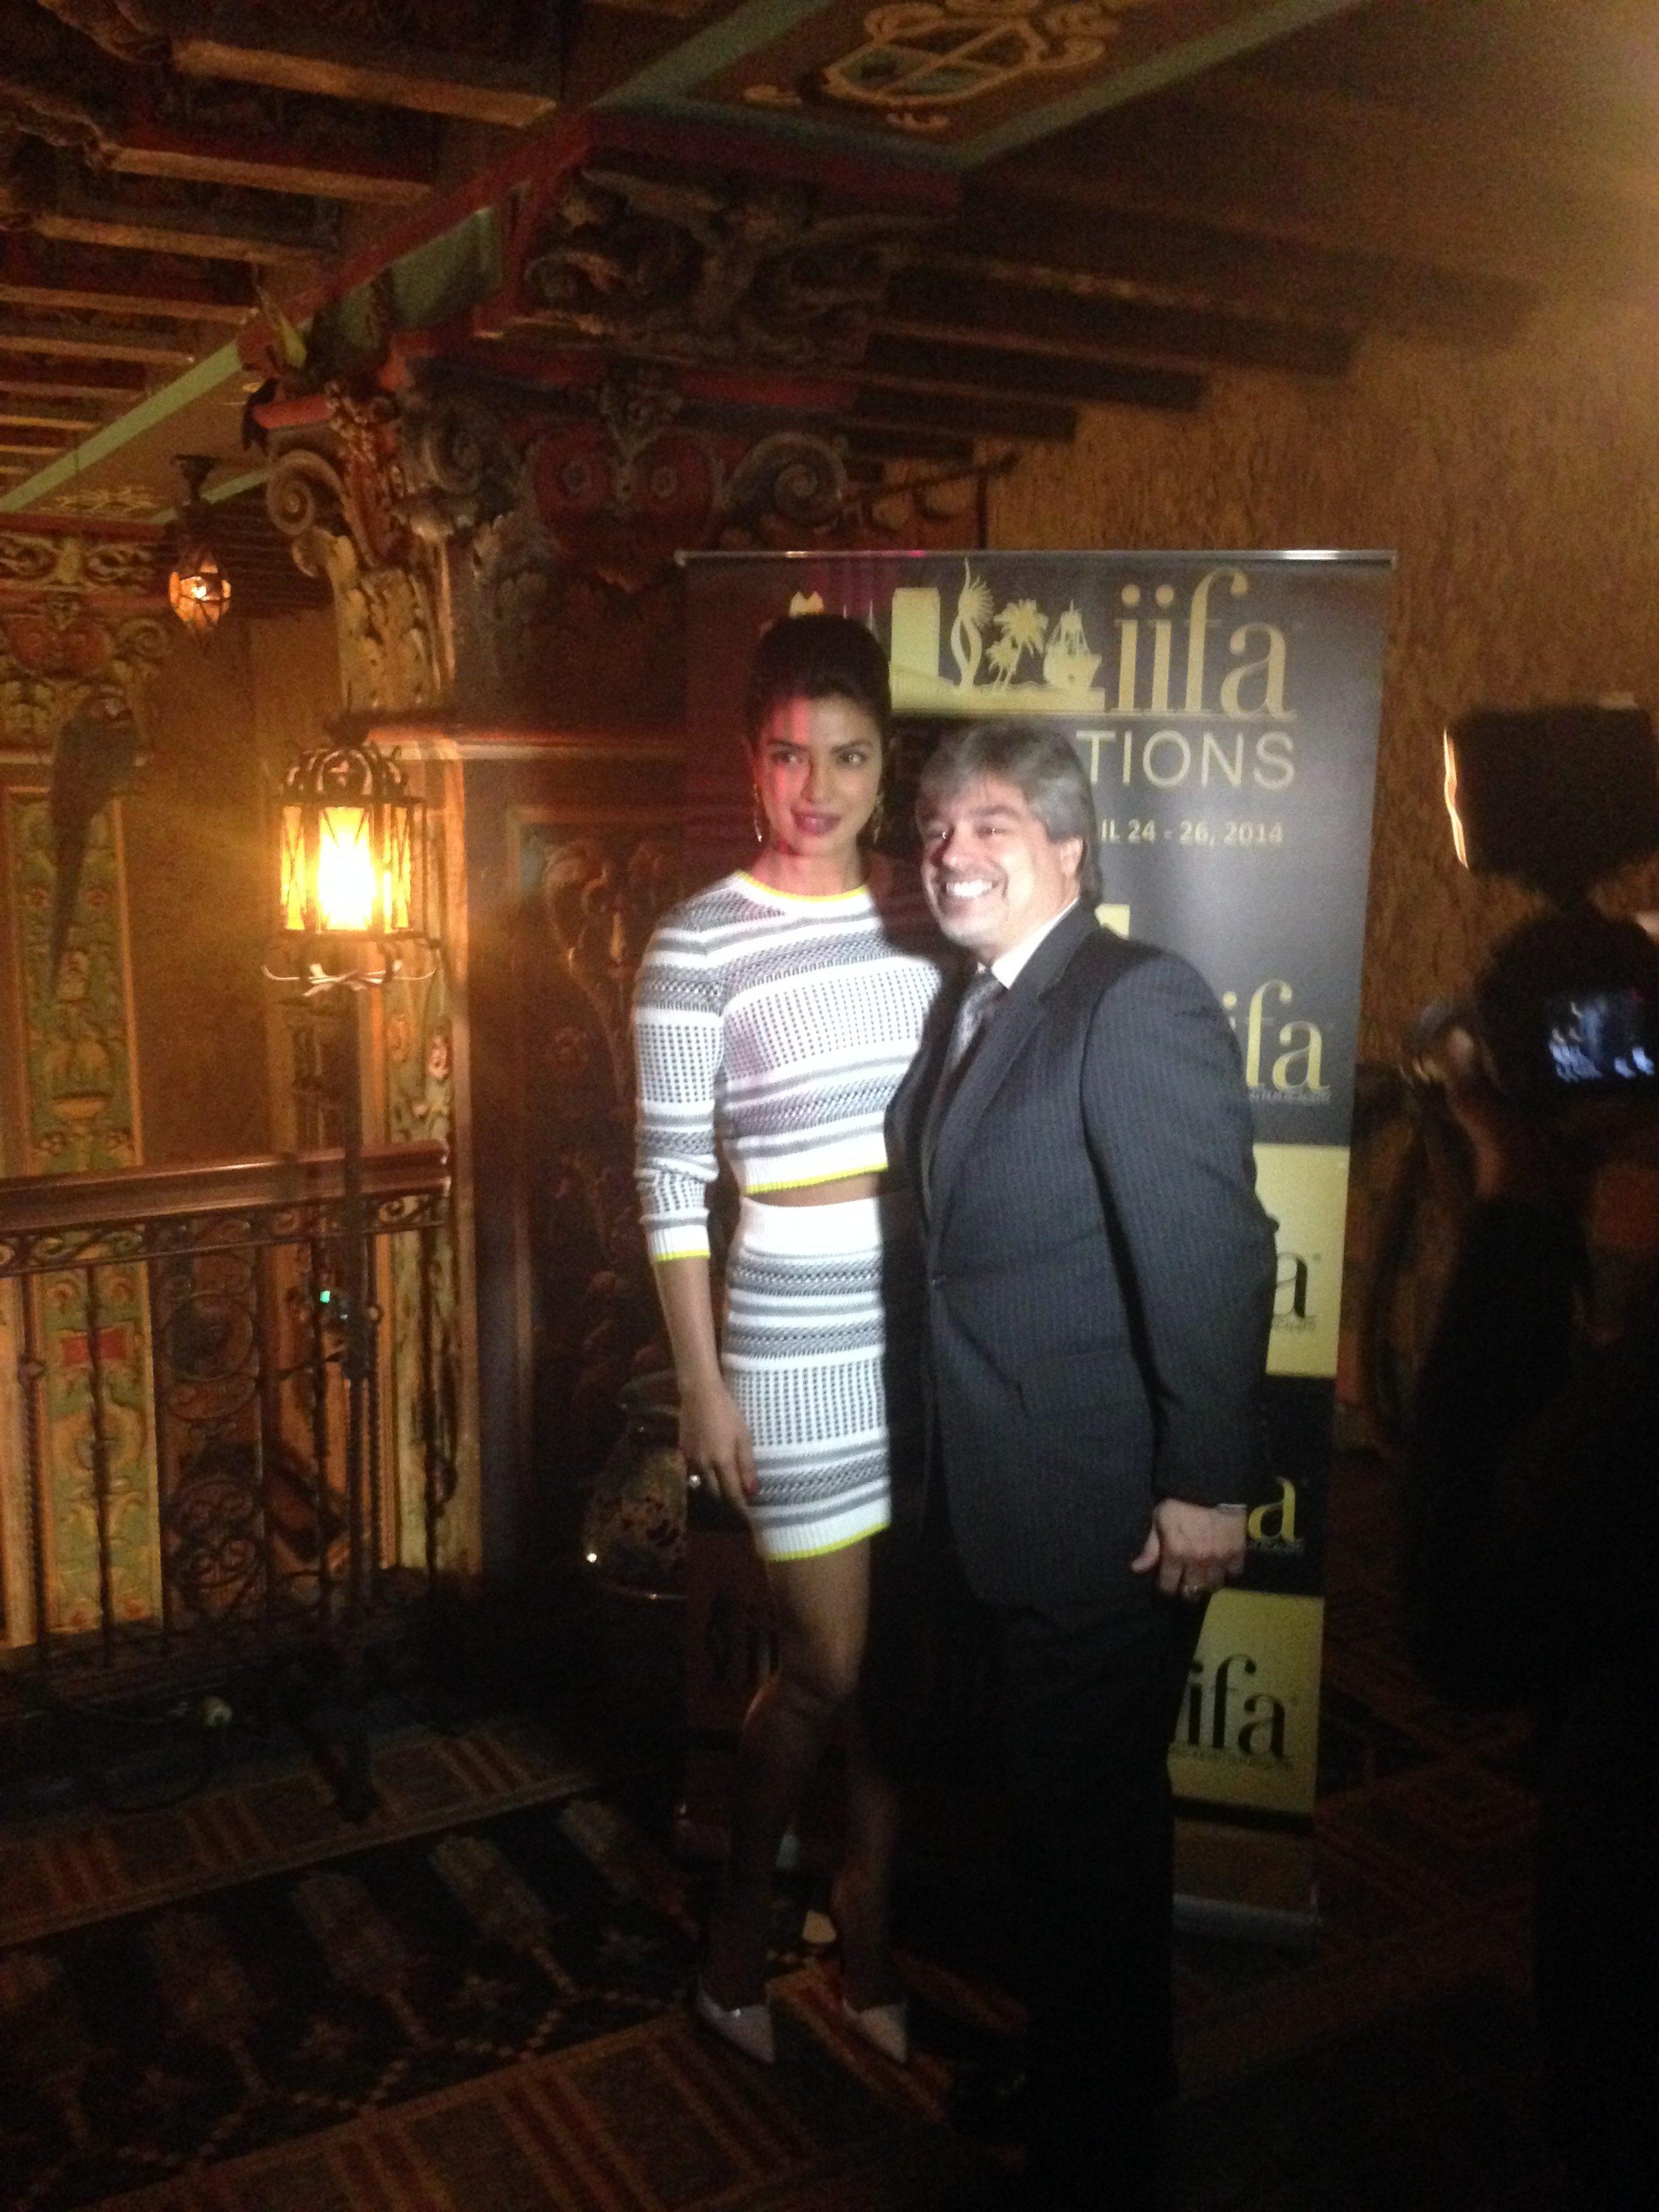 IIFA press conference 2014 (4)